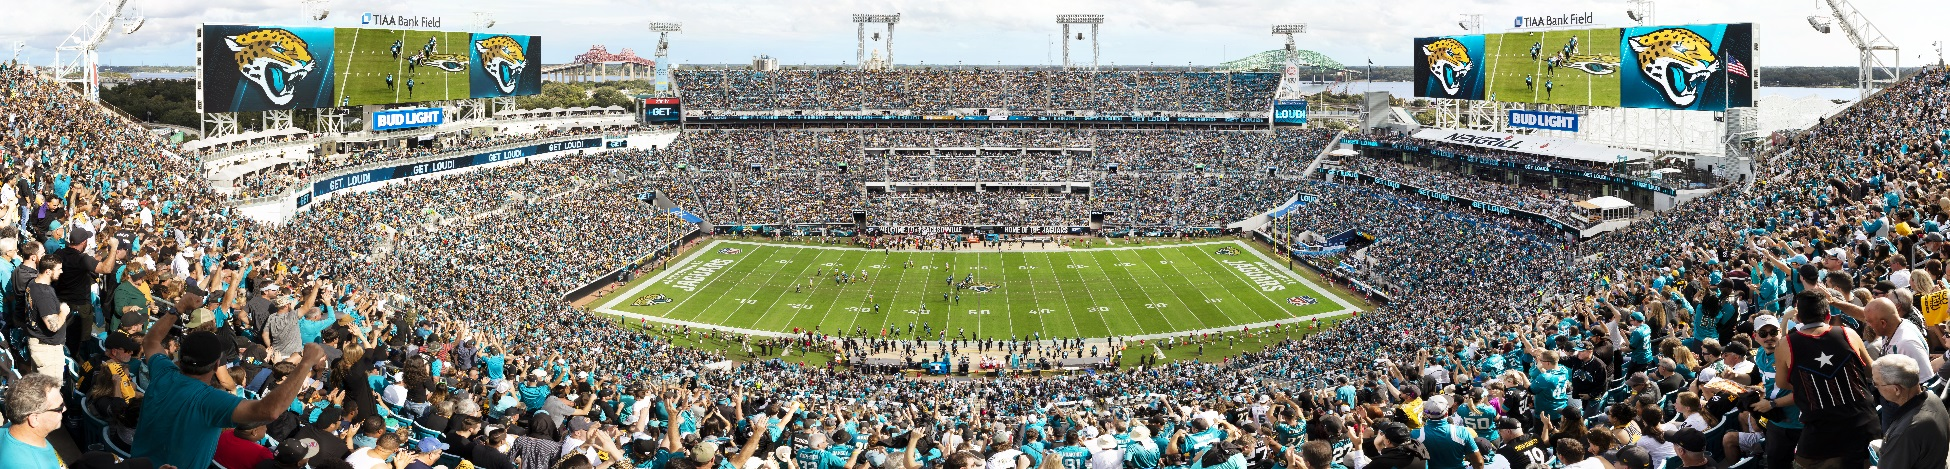 NFL-Jaguars